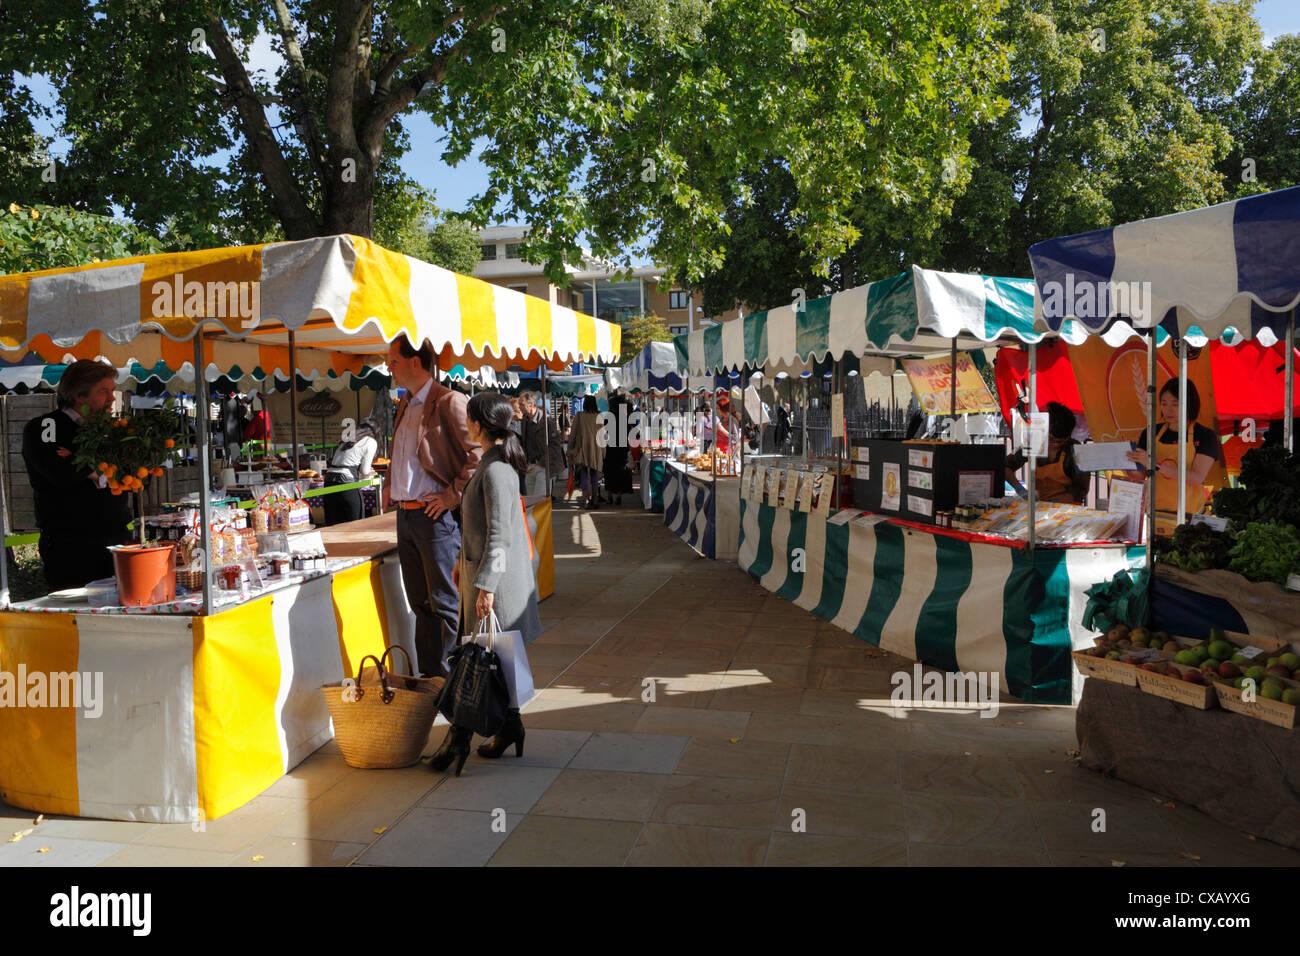 Sábado farmers market, duque de York Square, King's Road, Chelsea, Londres, Inglaterra, Reino Unido, Europa Imagen De Stock